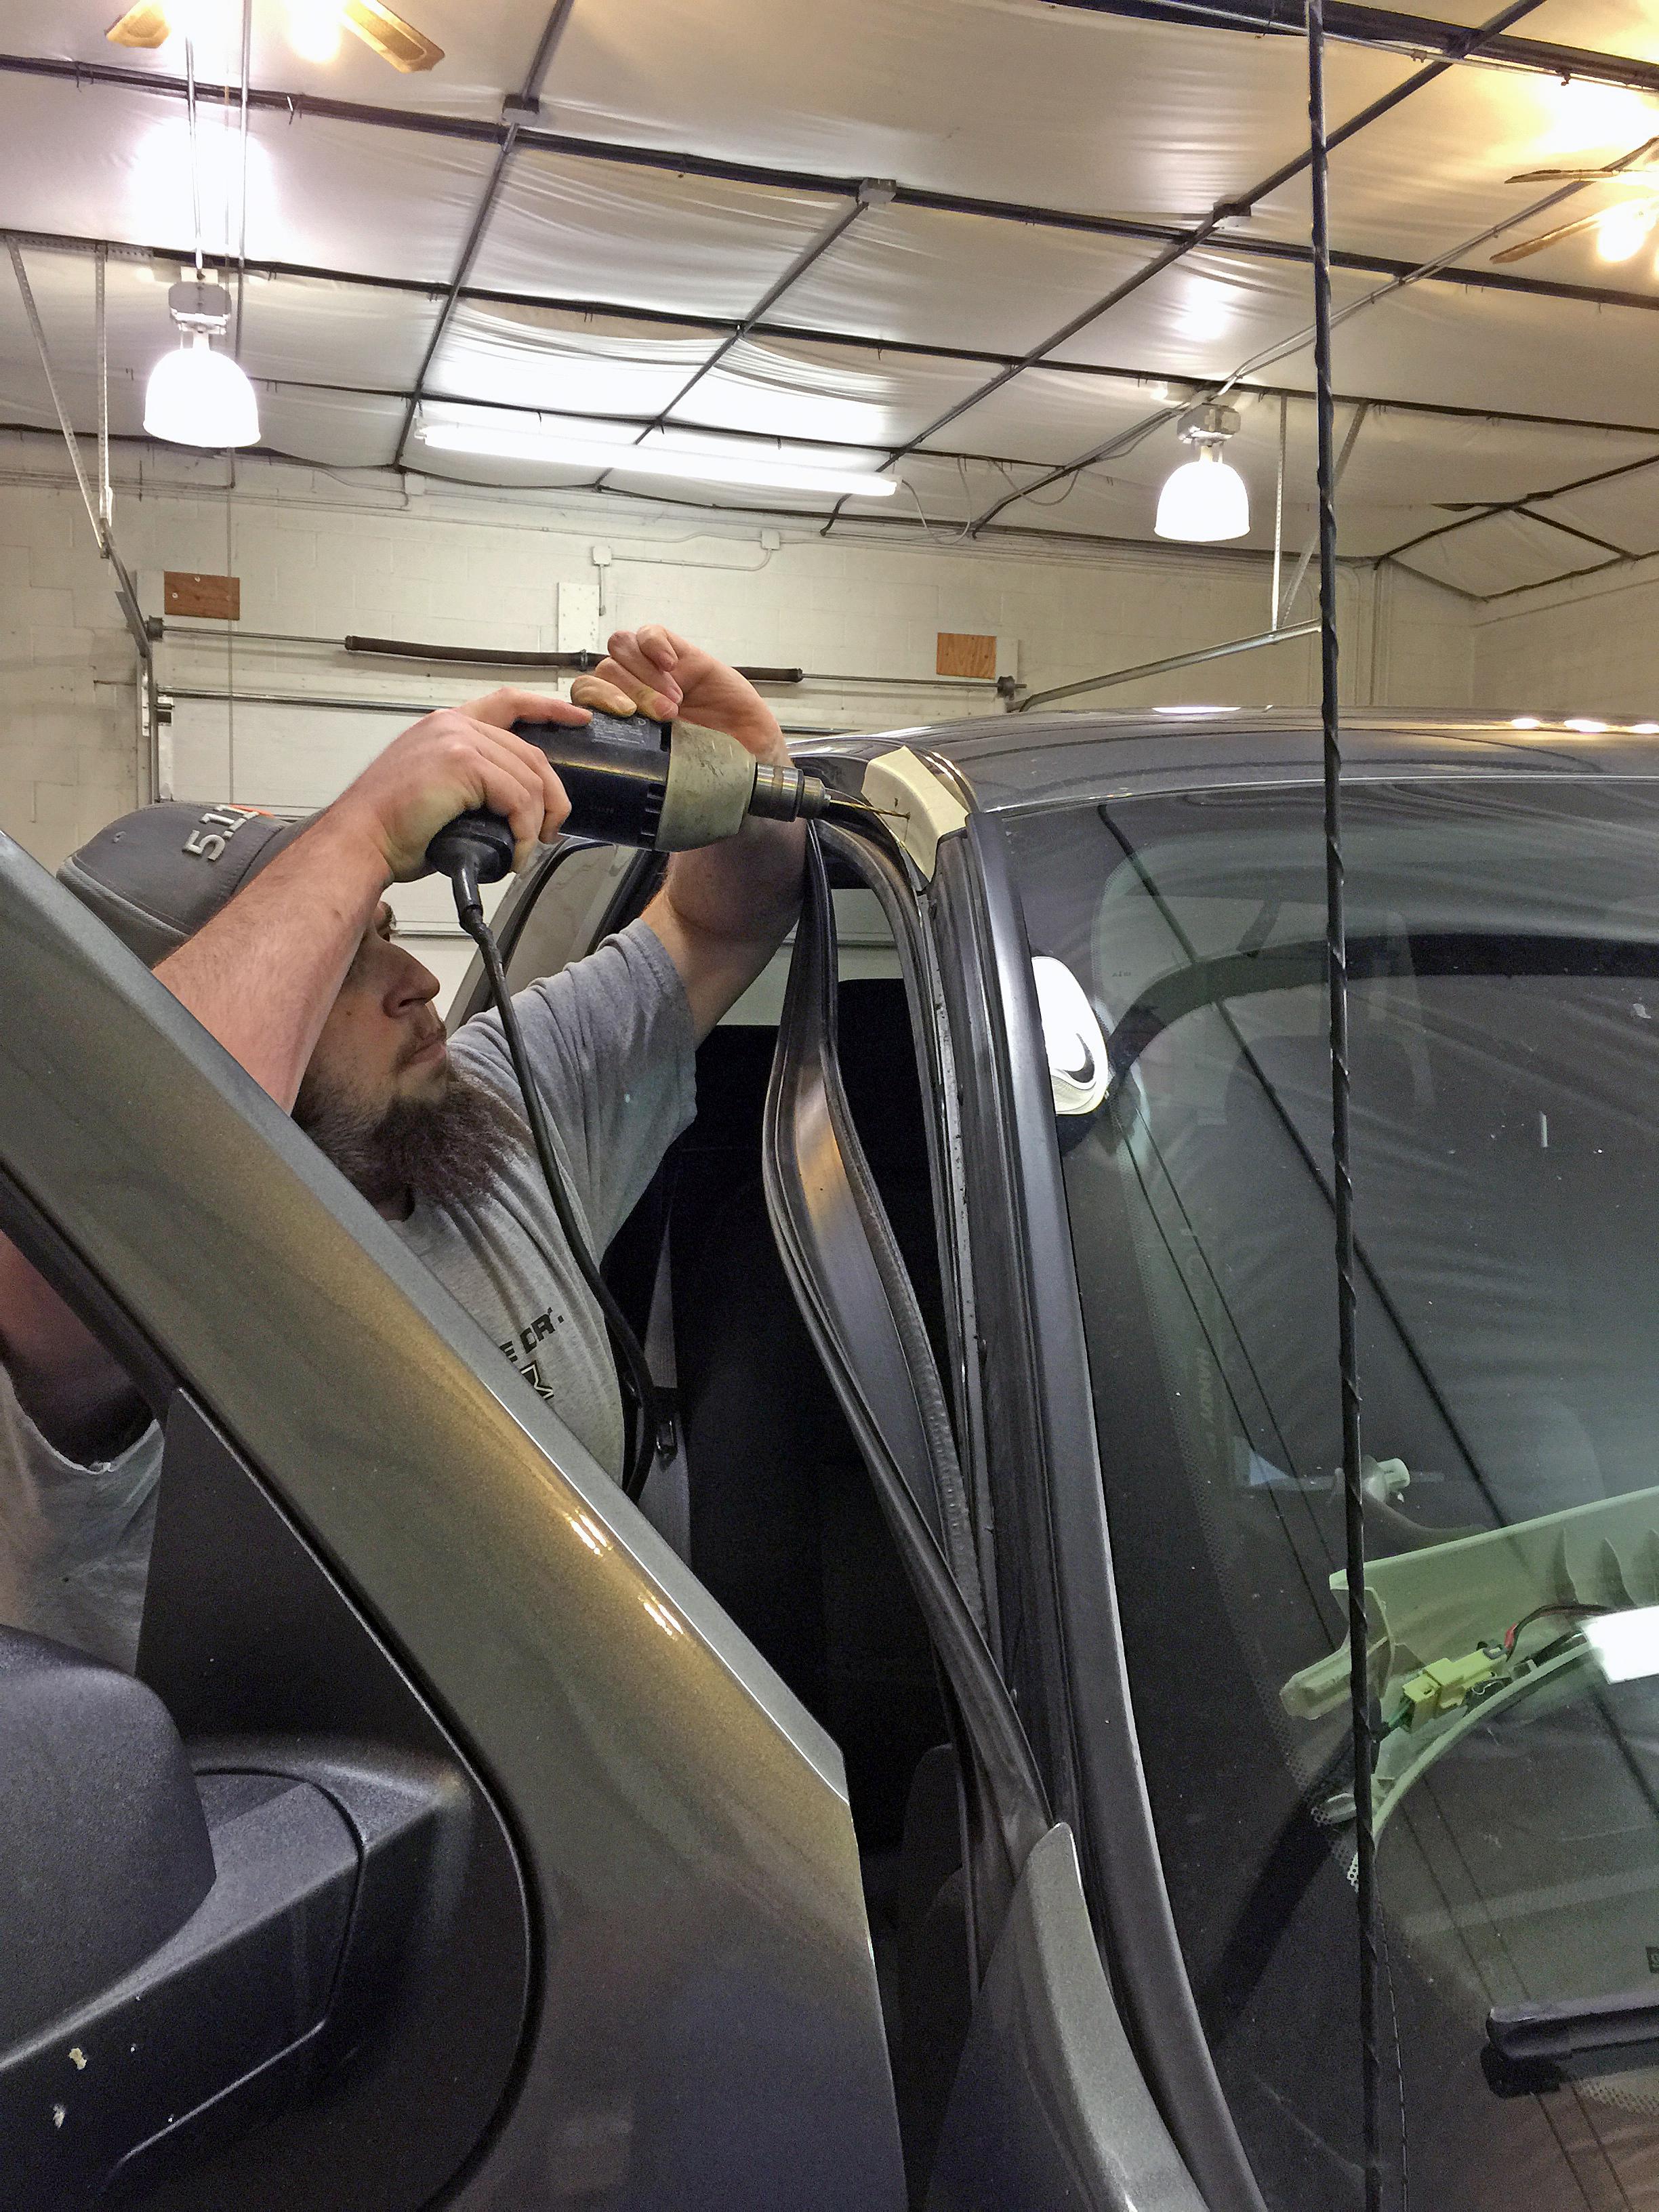 Putco Luminix Light Bar Lighbar LED Installation install installed on GMC Sierra Chevy Silverado by Global High Performance wholesale auto parts distributor exporter Ryan Ohrt GHP